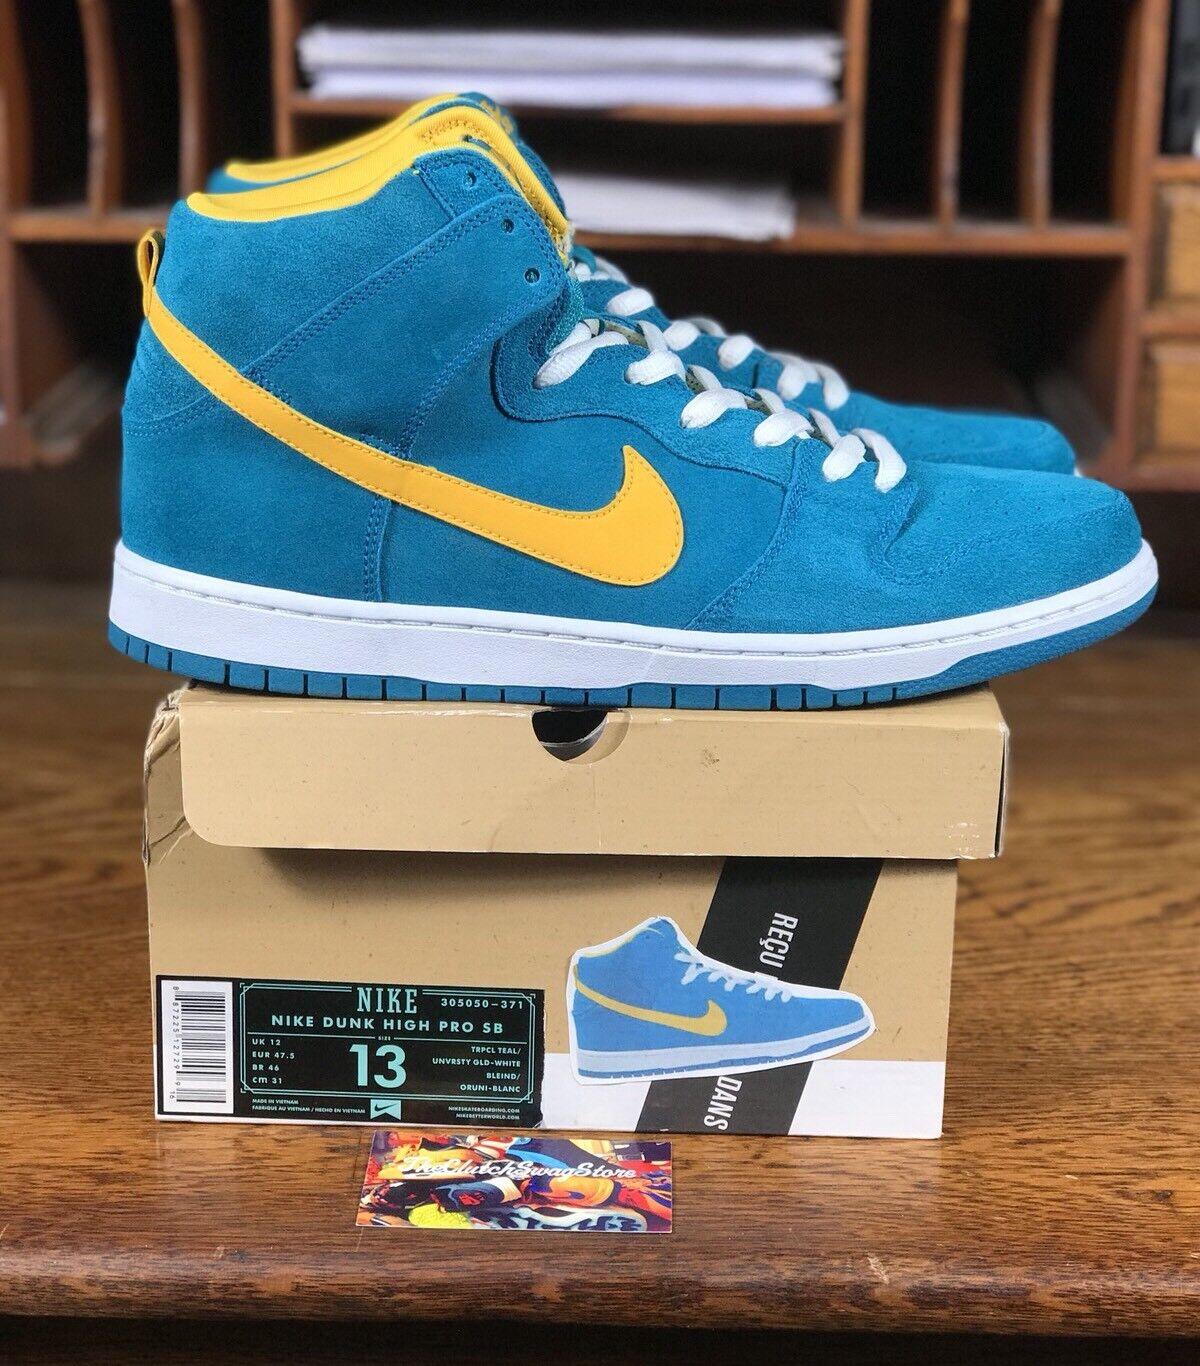 Nike SB Dunk High Premium Tropical Teal Gold Mens Skate Shoe 305050-371 Size 13